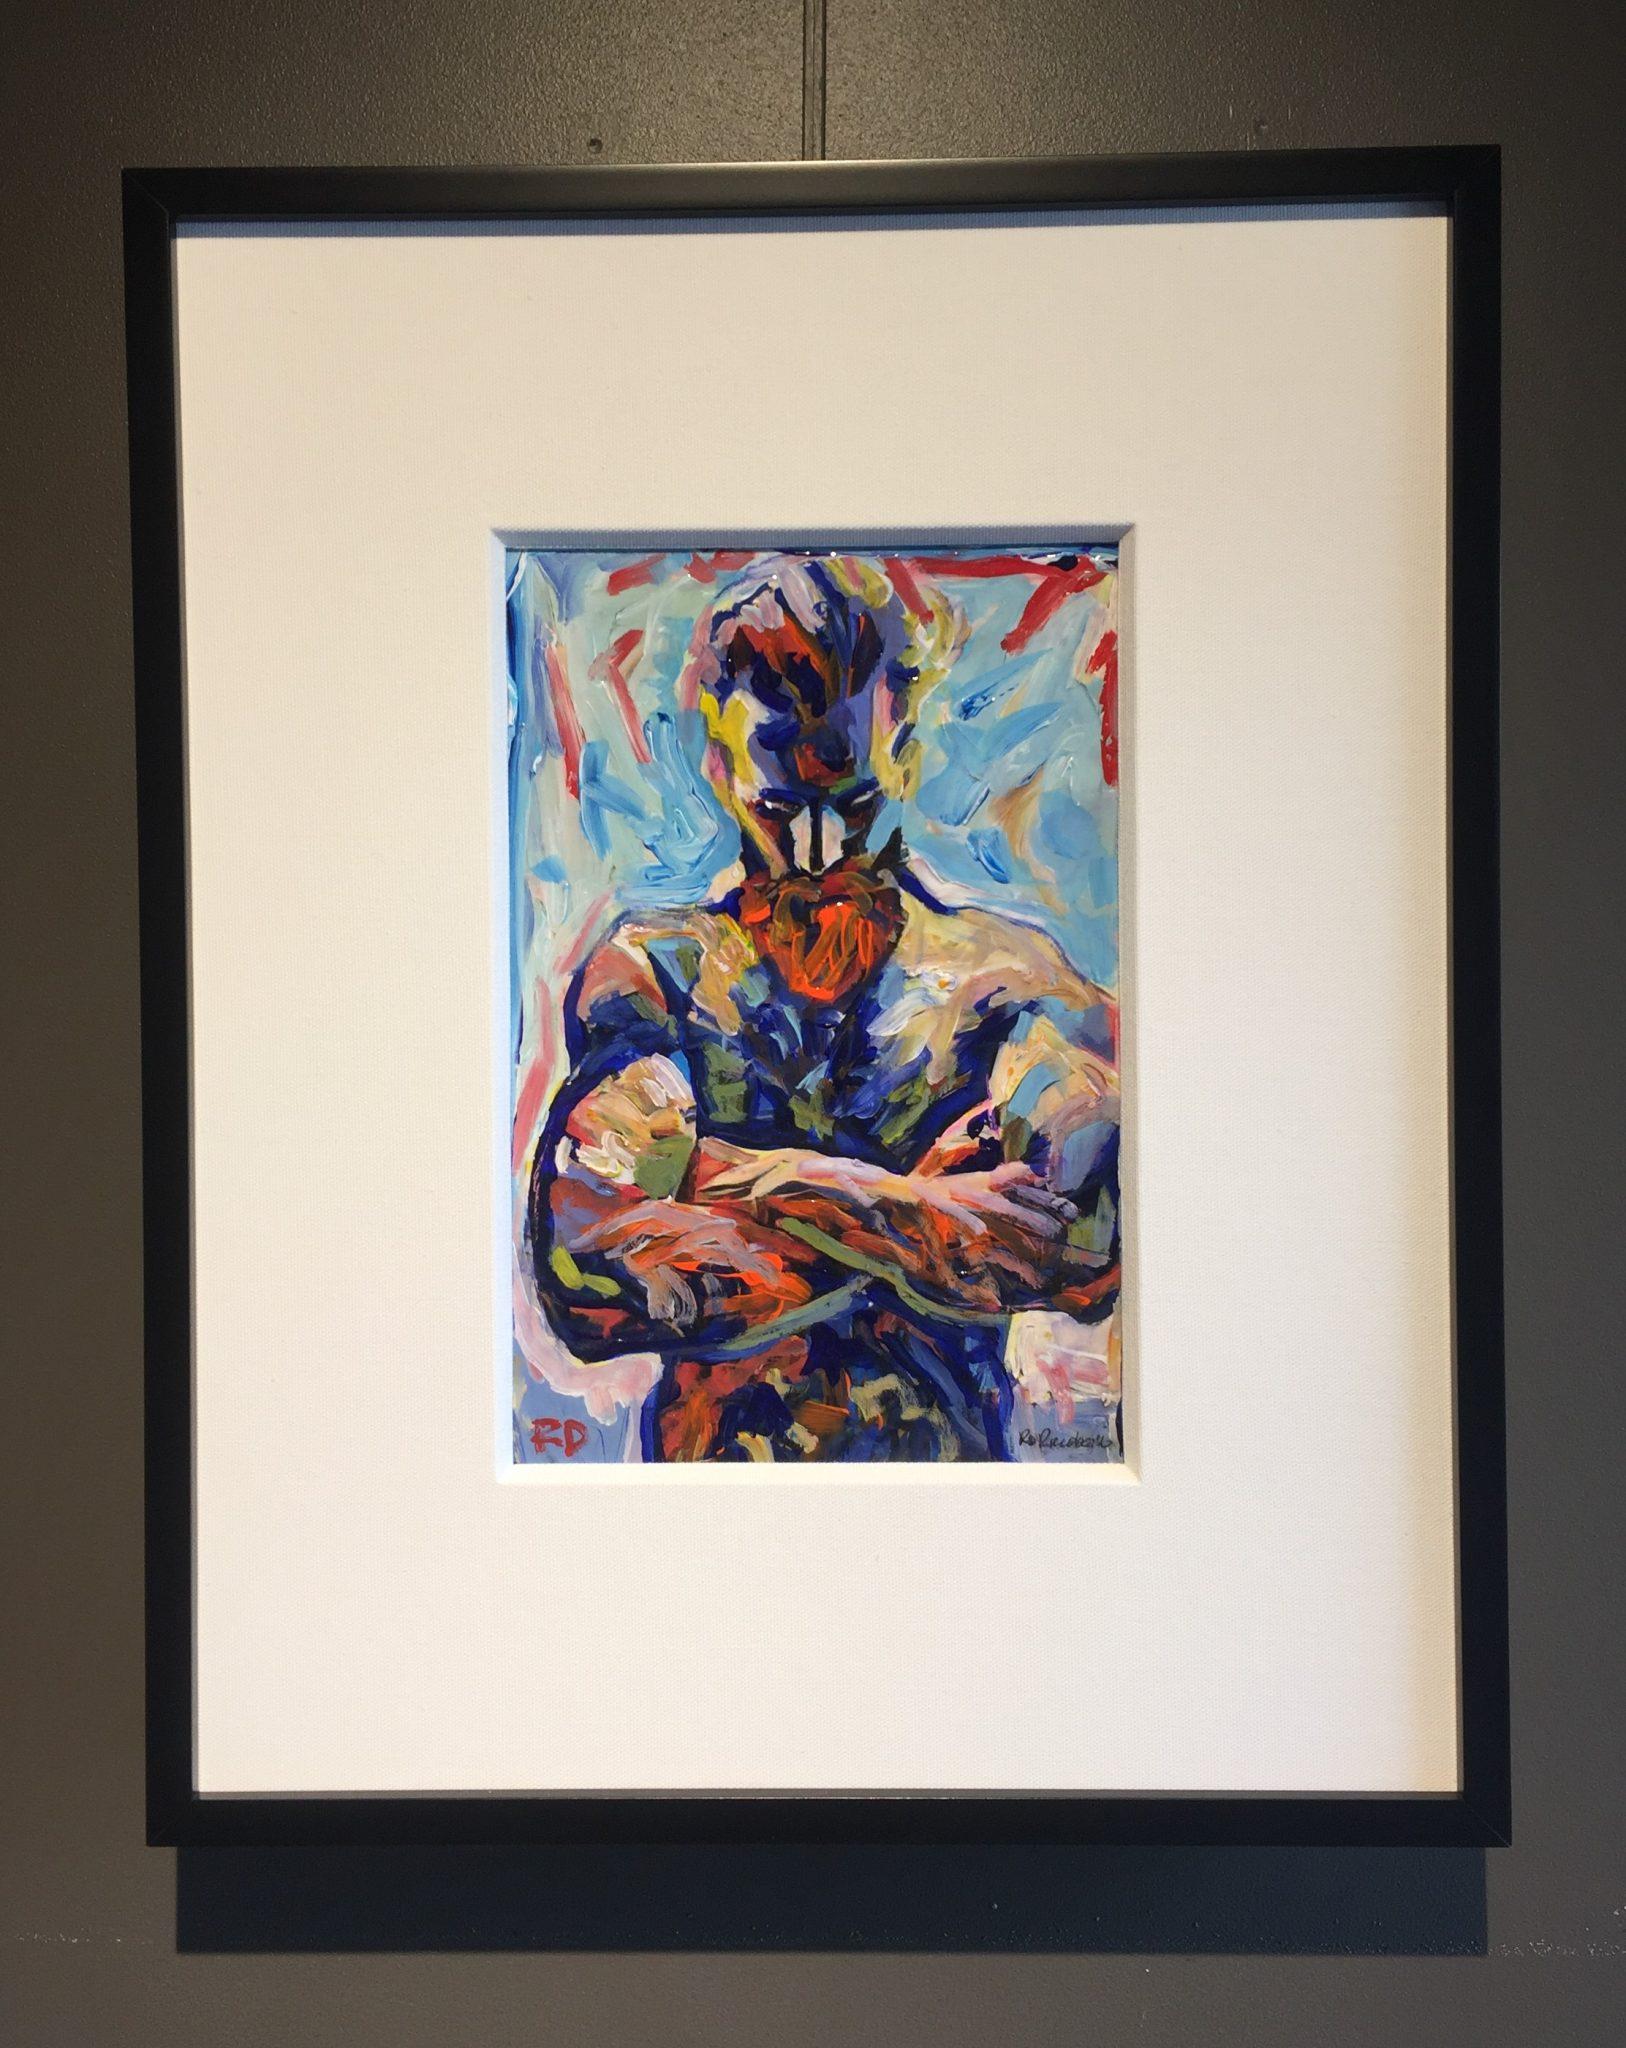 RD Riccoboni - The Frame Maker San Diego